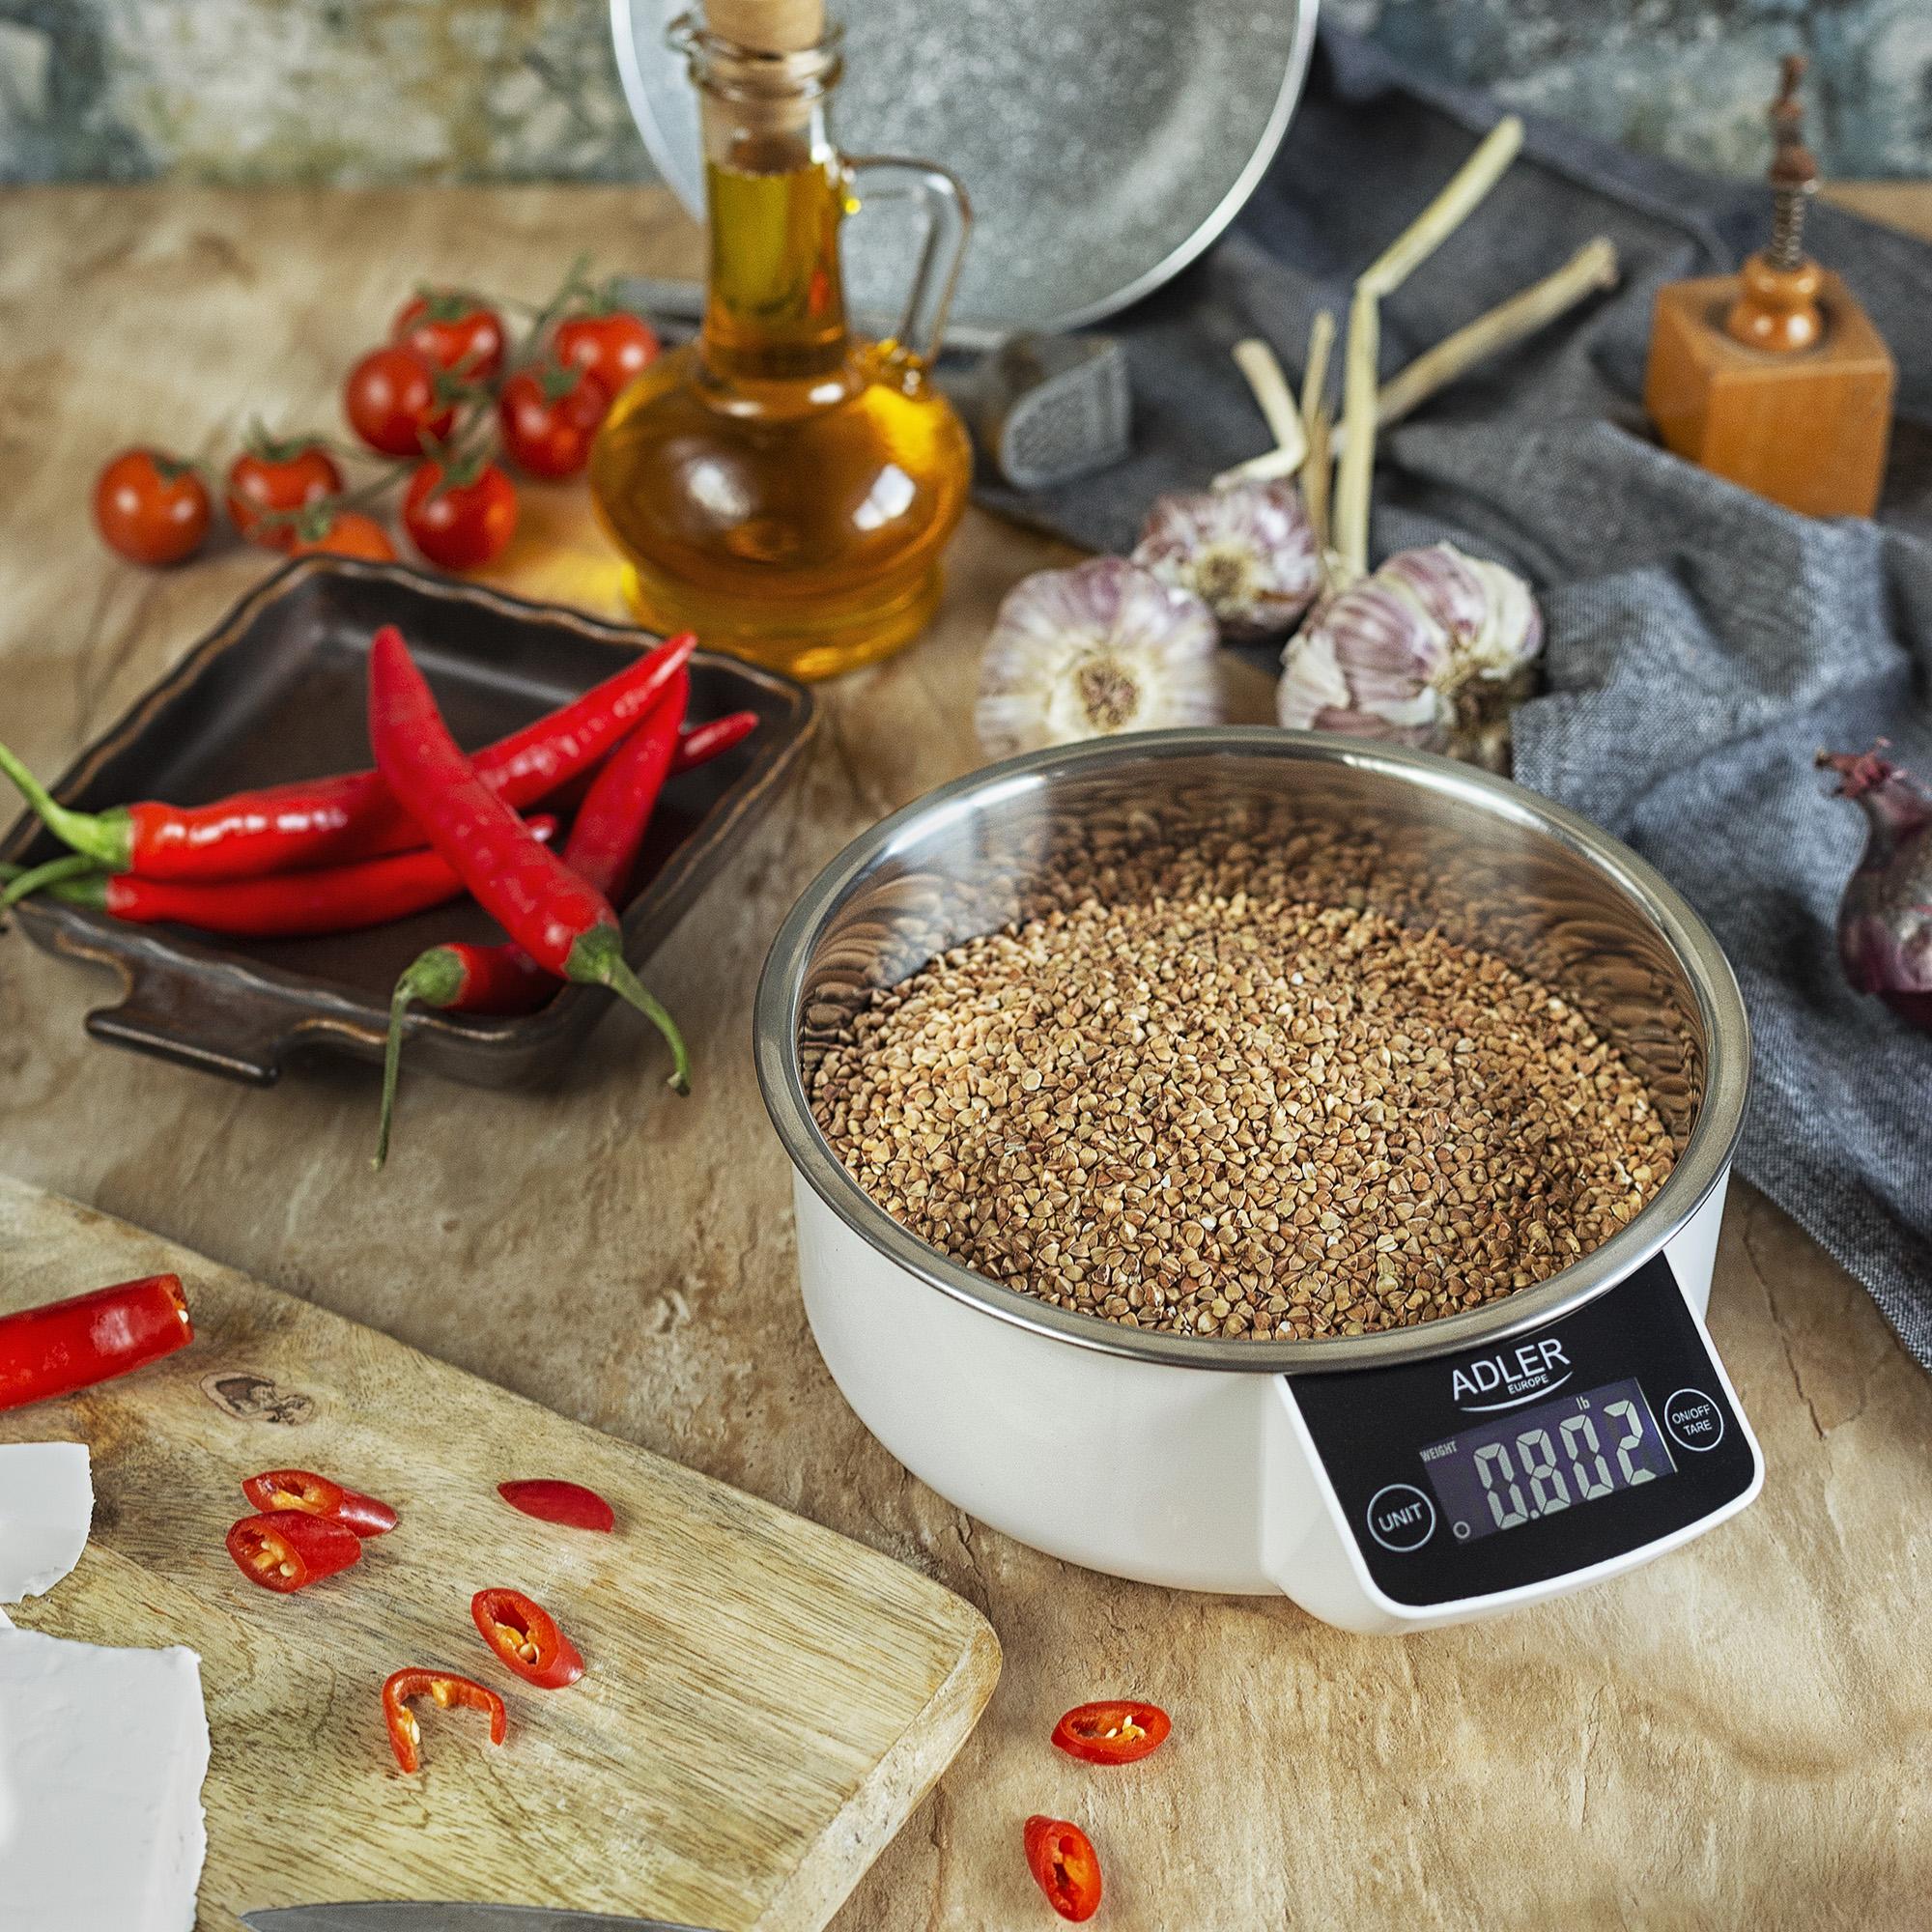 Adler AD 3166 Balanza Electrónica de Cocina Digital con Bol, 900 ml, 5 kg (11 lb), Alta Precisión 1g, TARA, medición de Líquidos